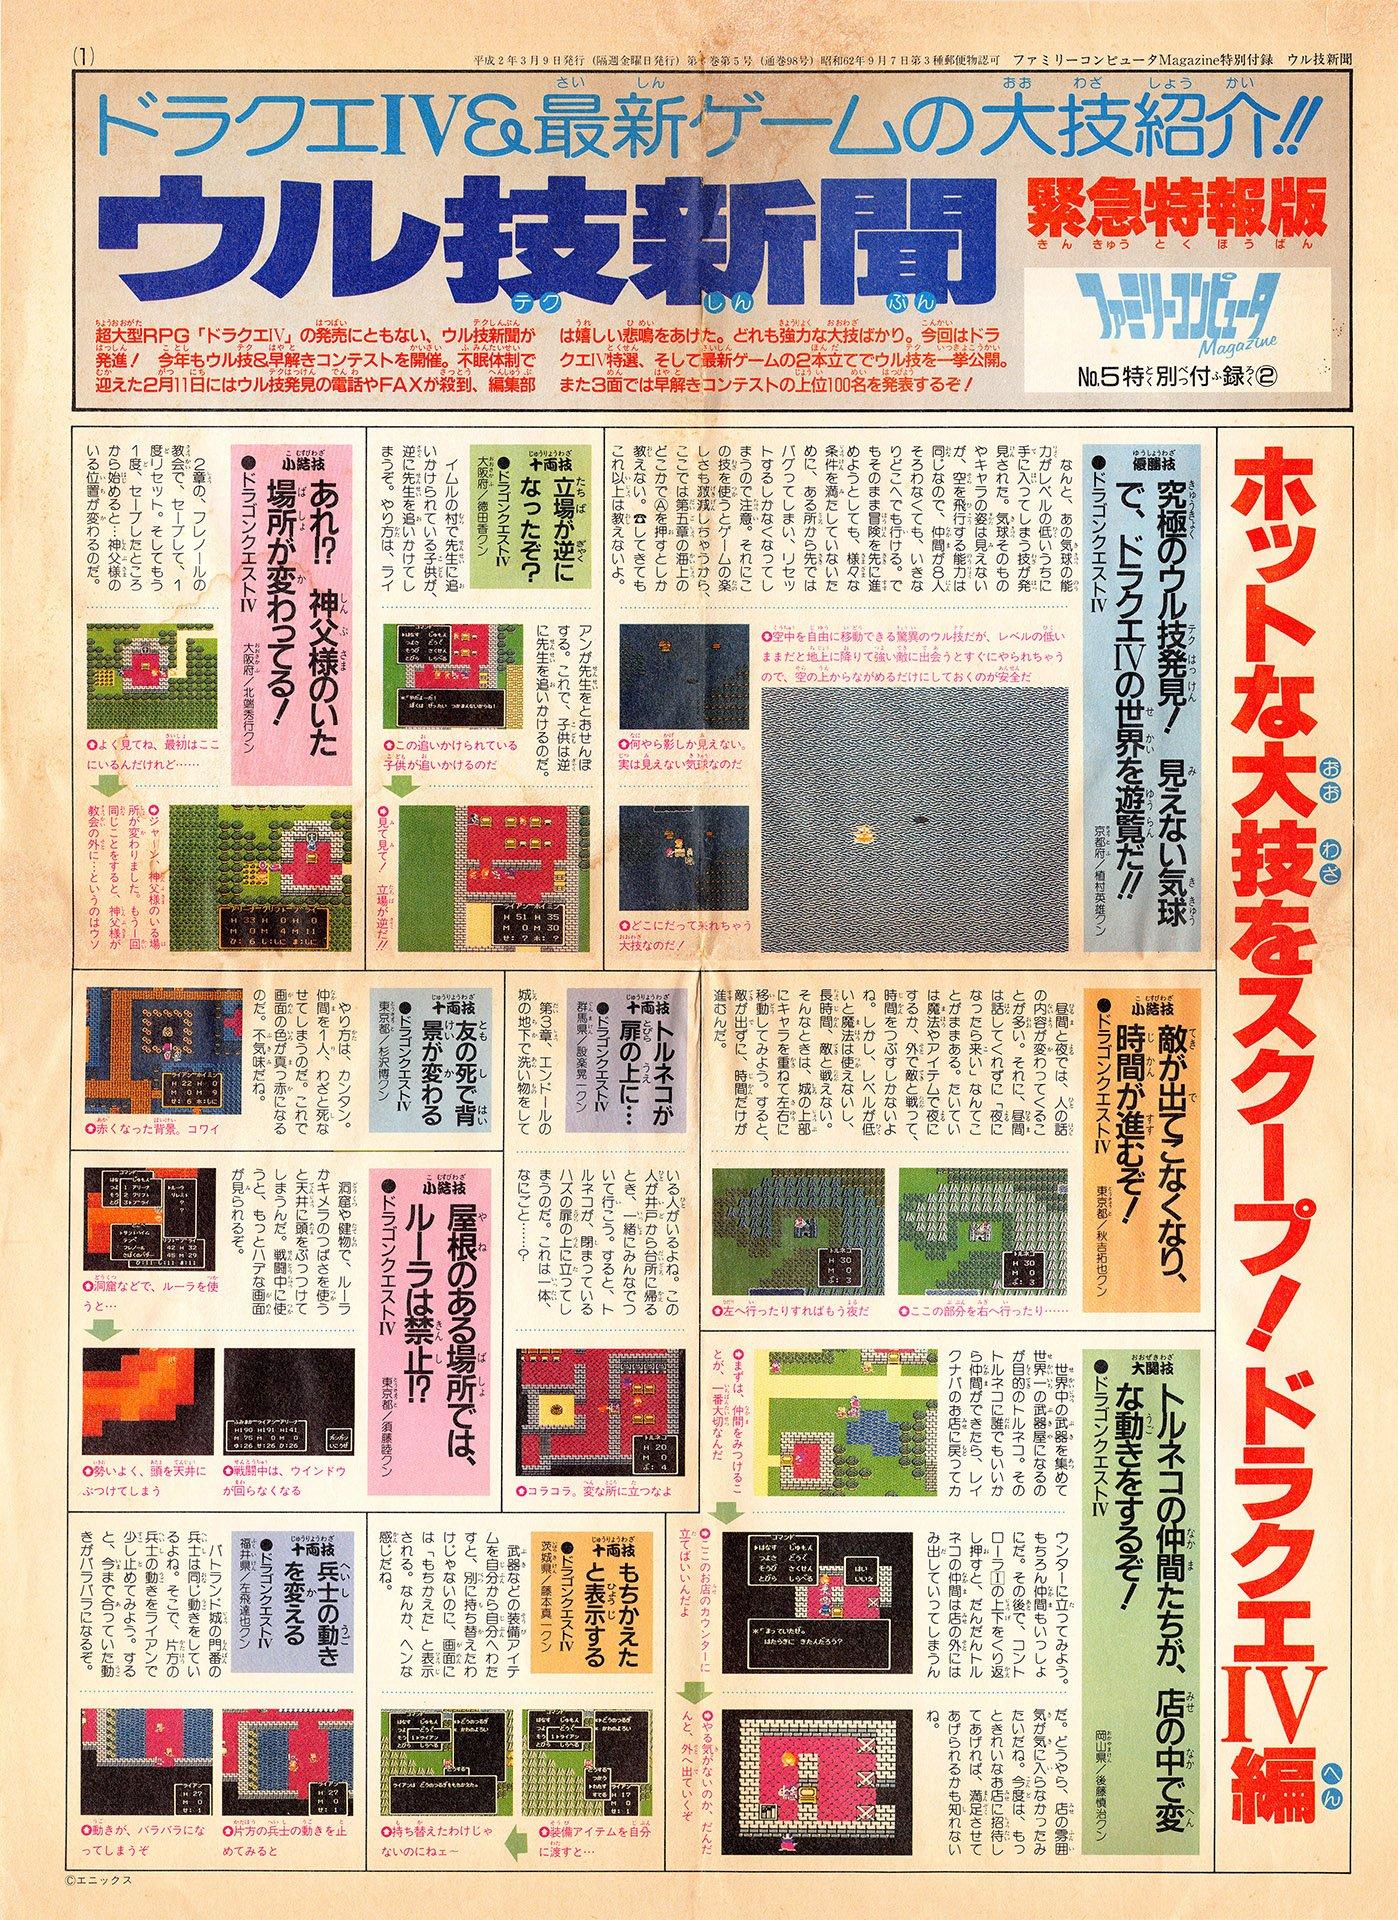 large.422728783_UltechShinbun(Issue98supplement)(March91990).jpg